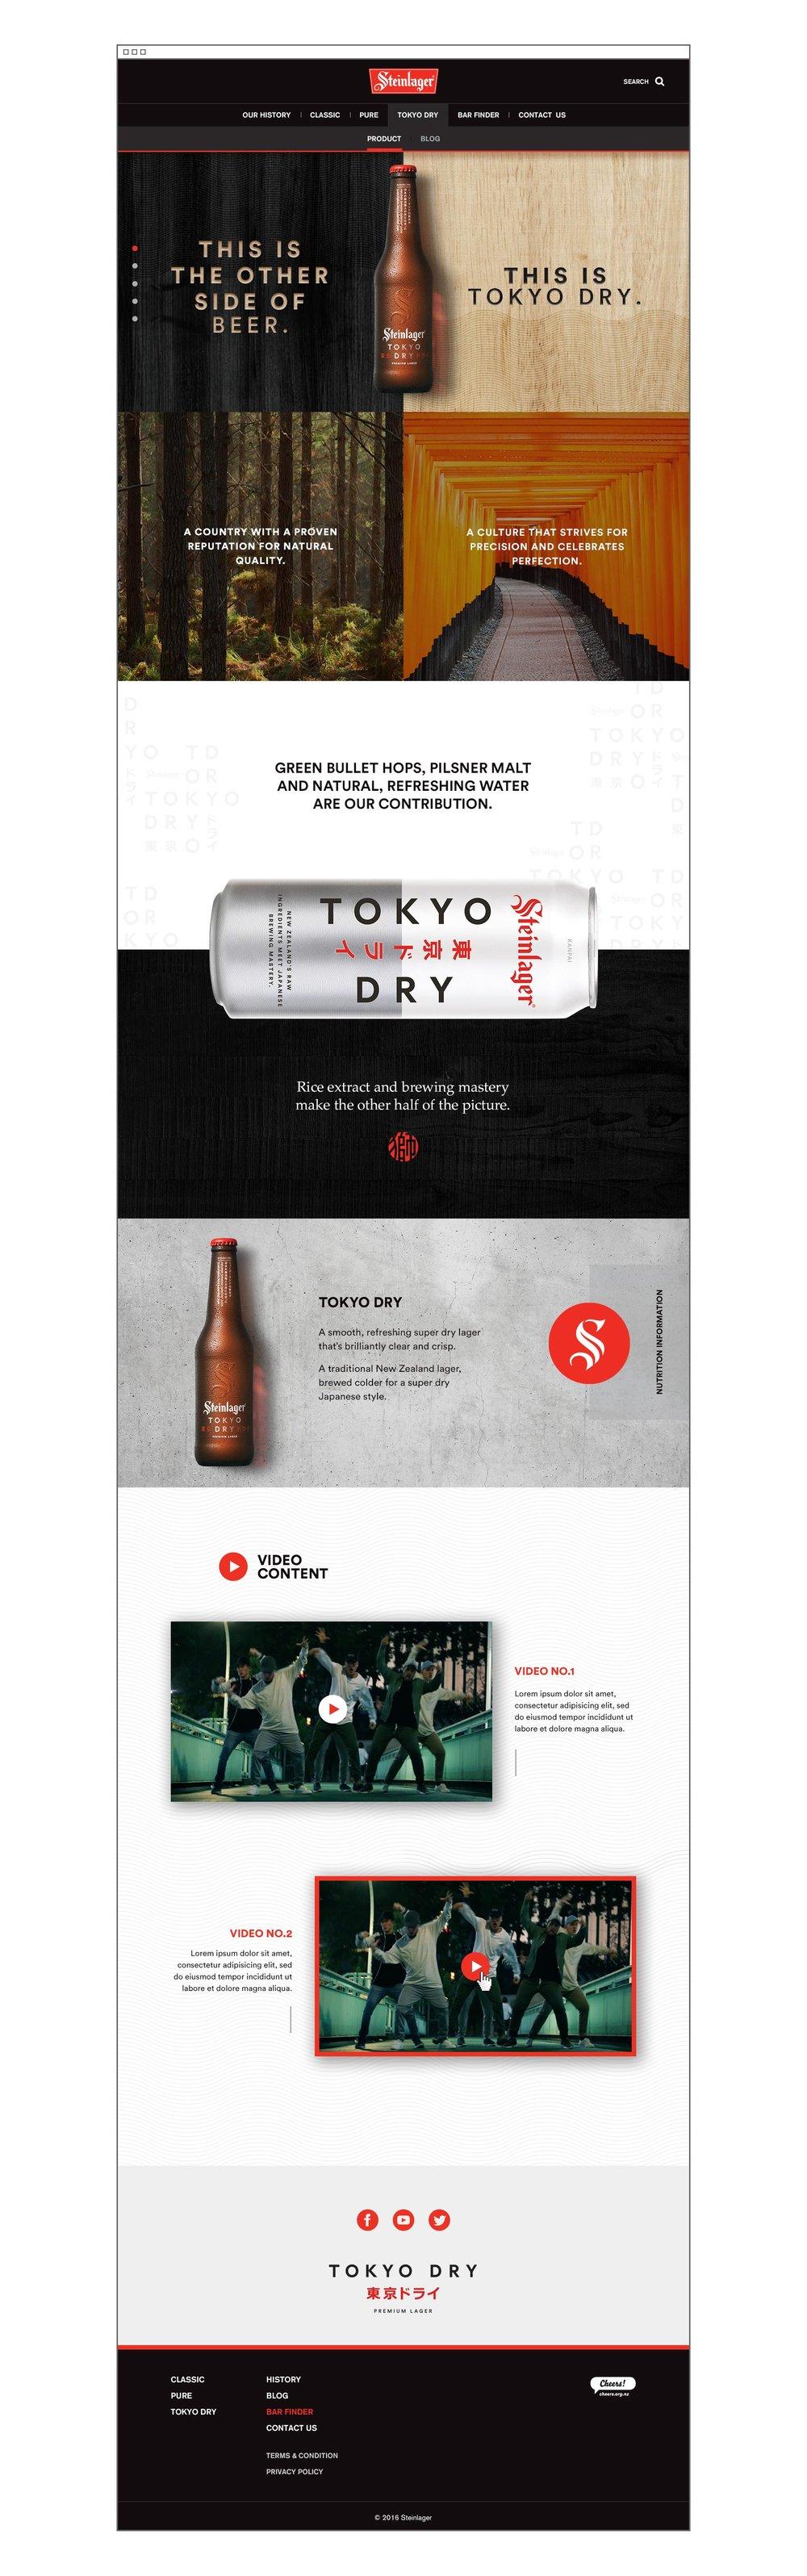 Tokyo - Browser - full.jpg